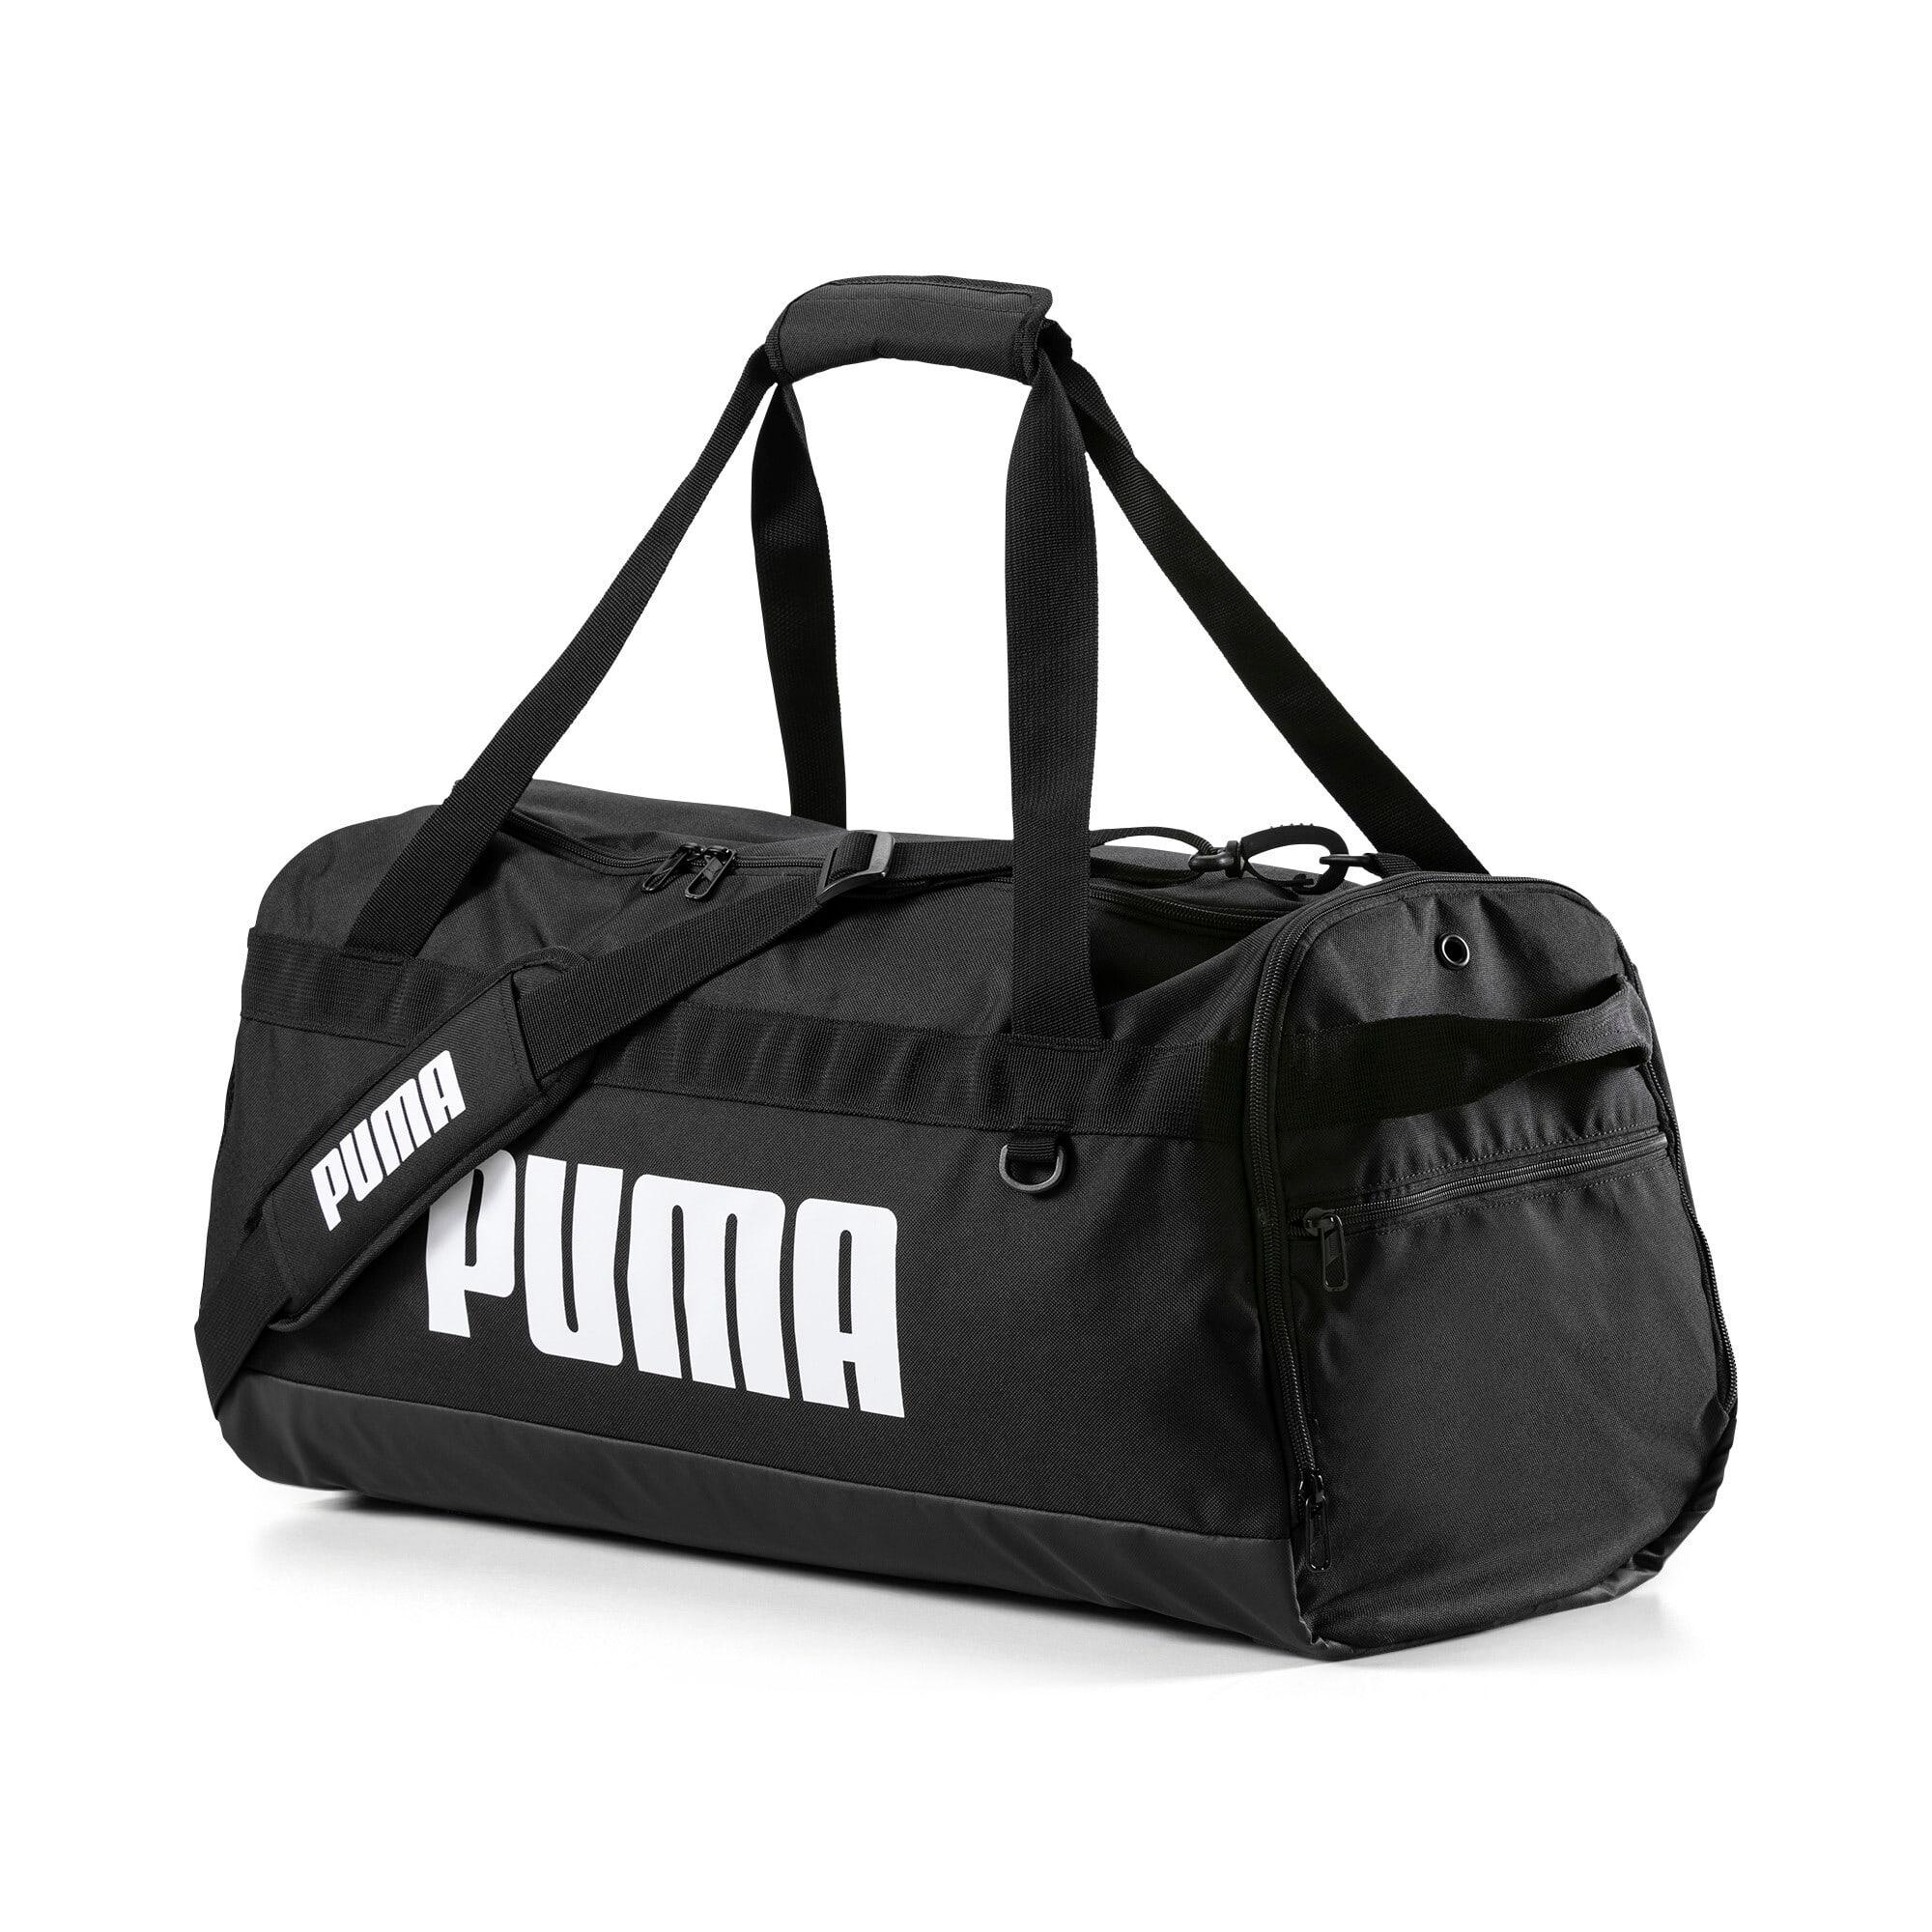 Thumbnail 1 of PUMA Challenger Duffel Bag, Puma Black, medium